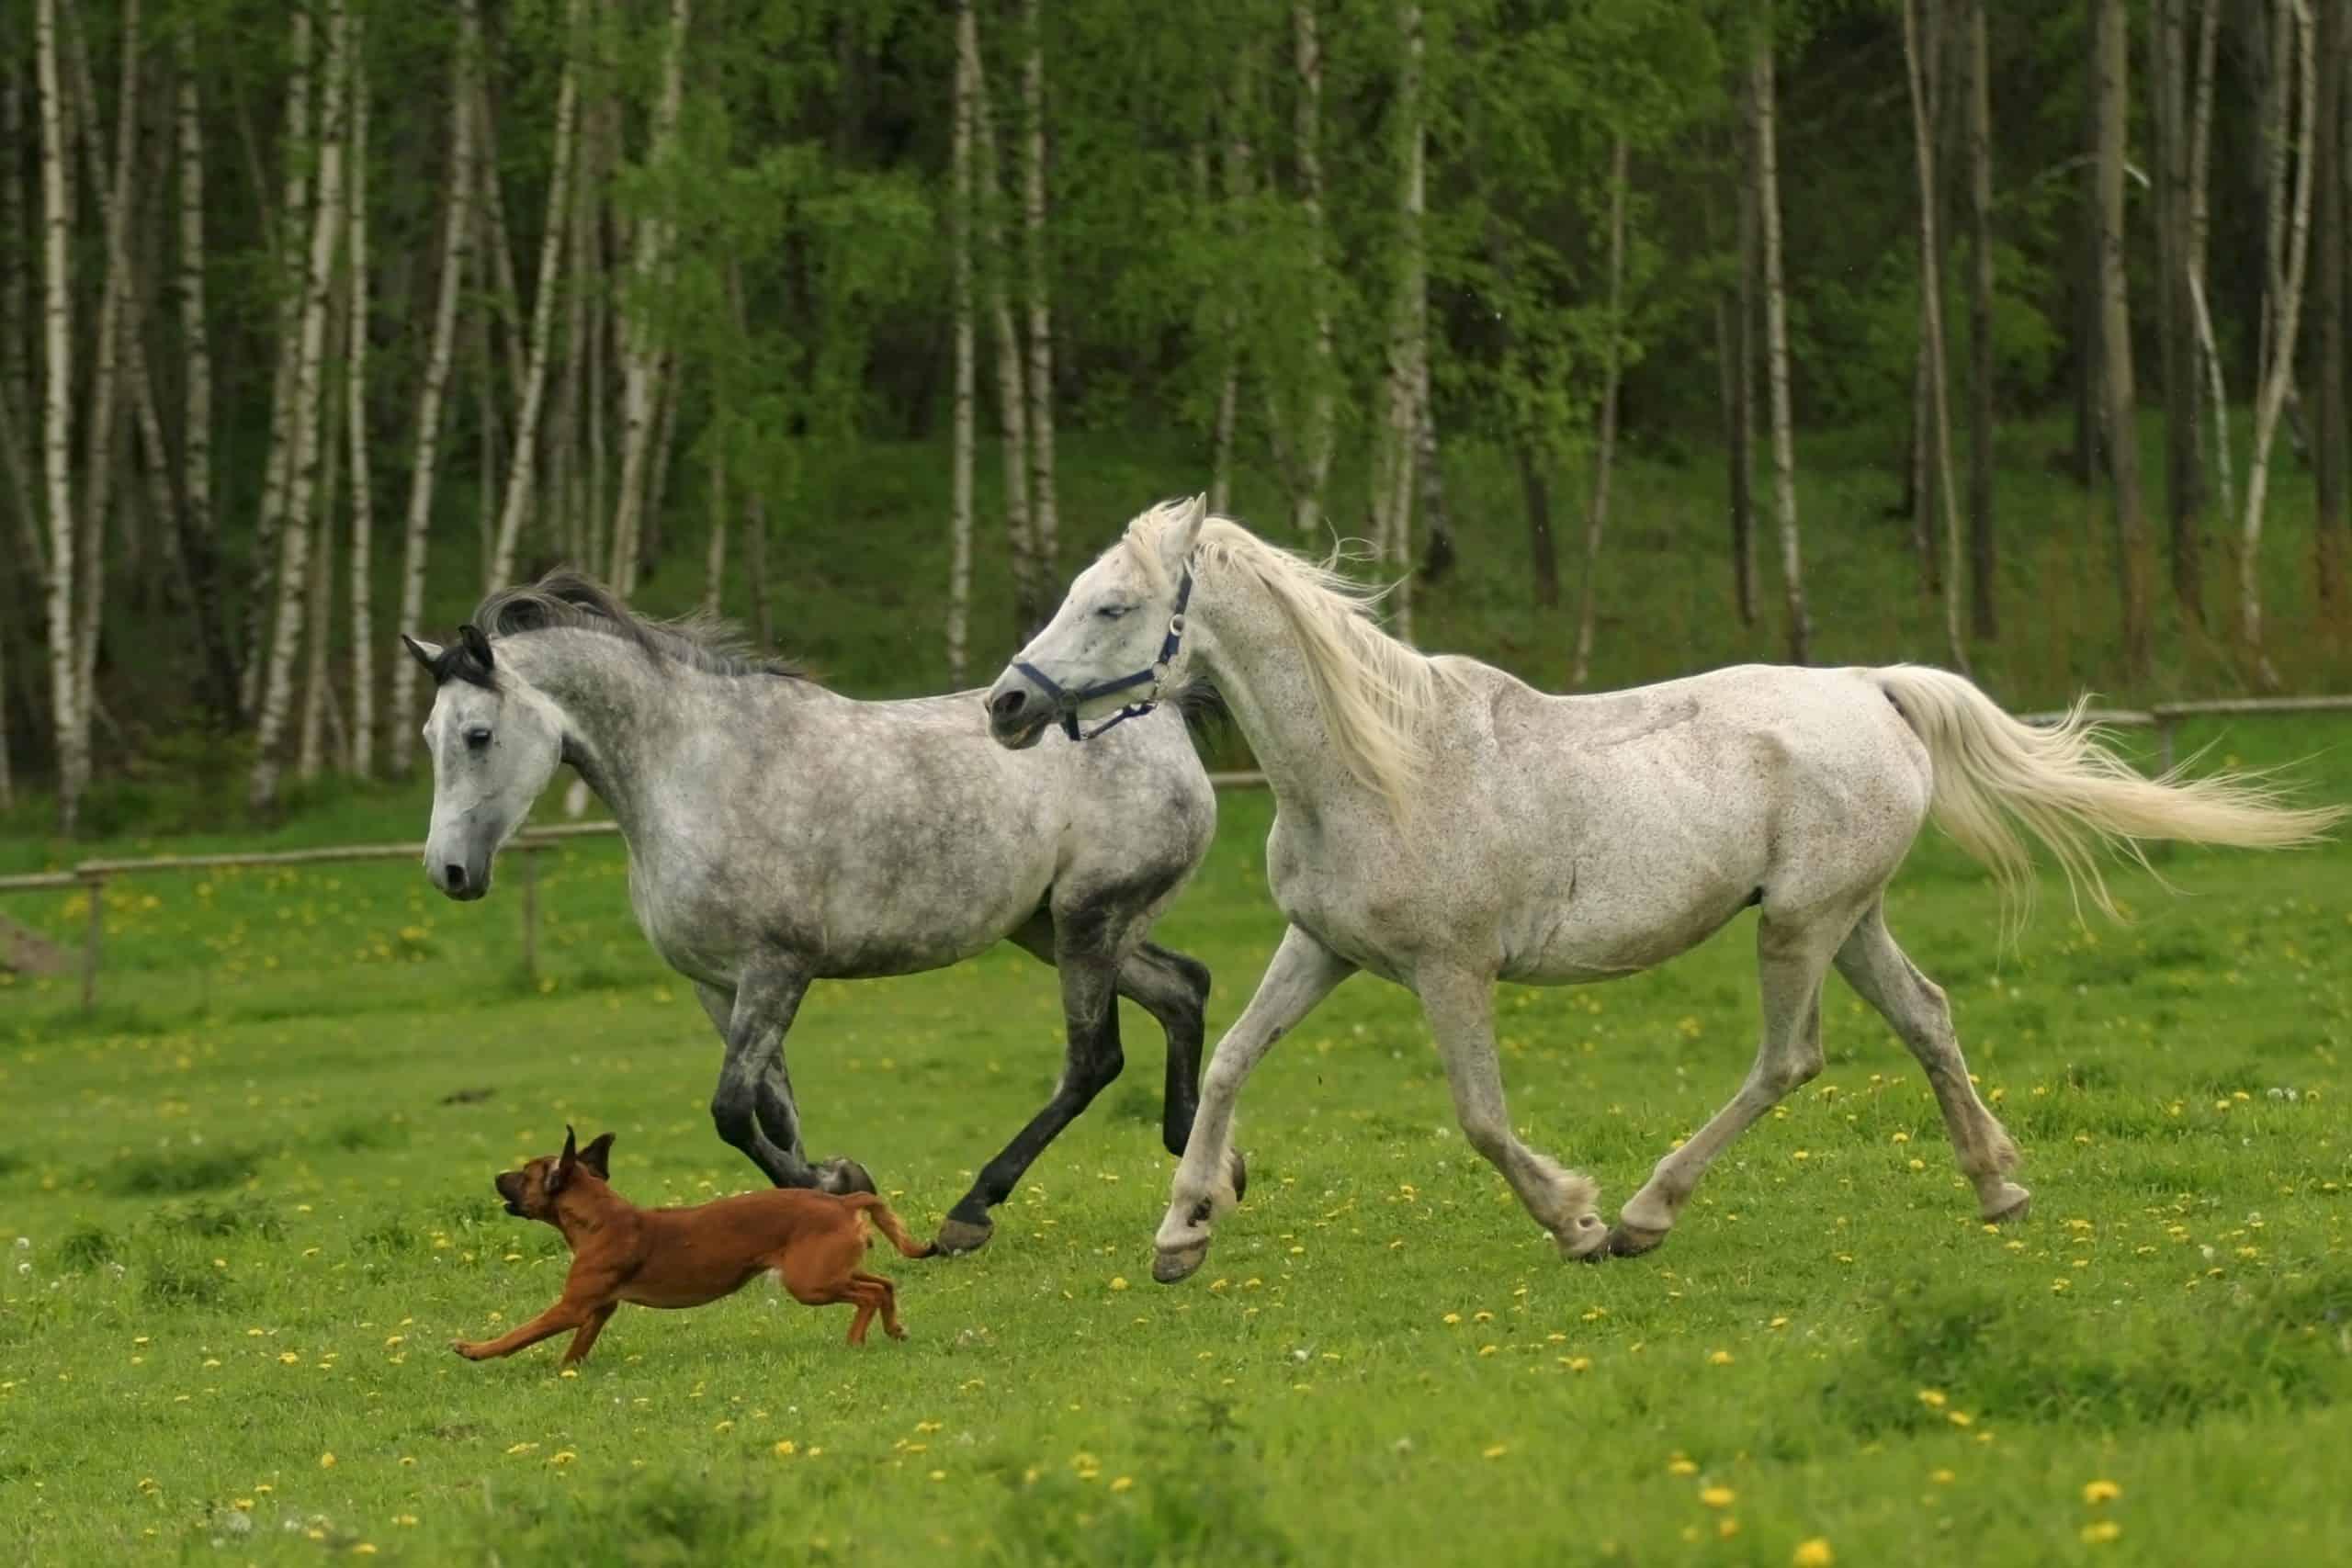 running Arabian horses and dog, Shagya arab, white horses